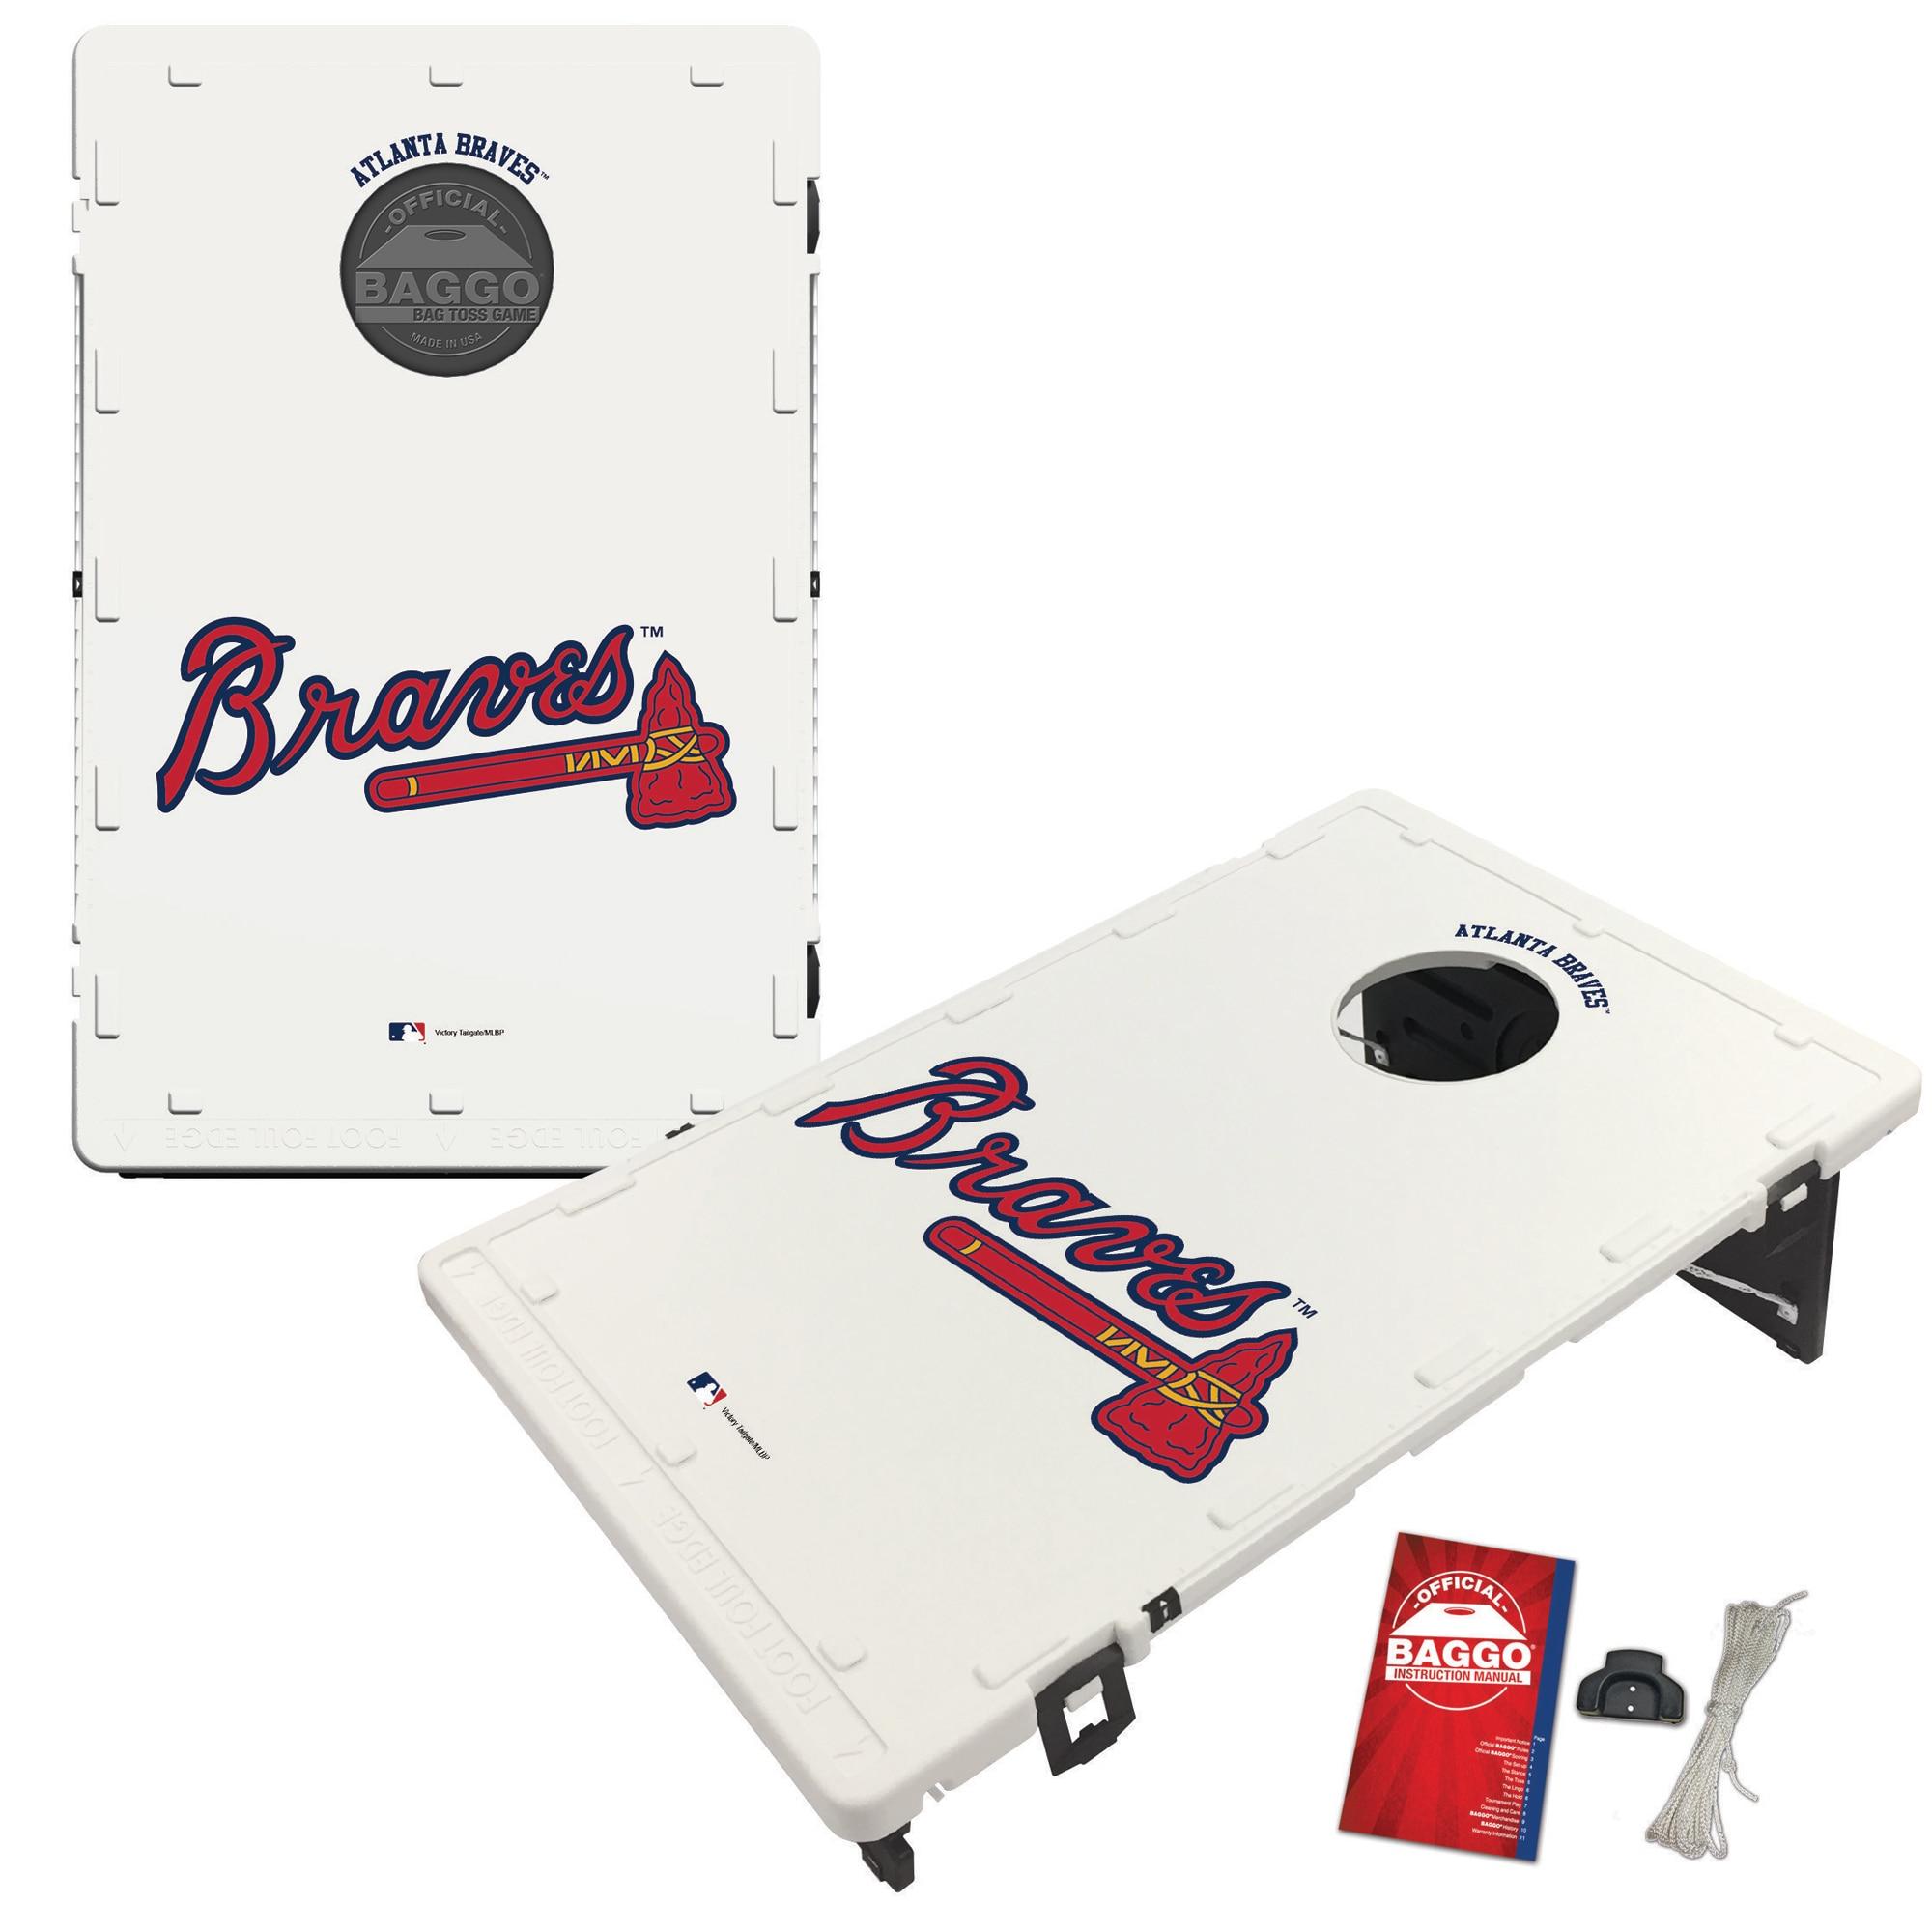 Atlanta Braves 2' x 3' BAGGO Classic Cornhole Board Tailgate Toss Set